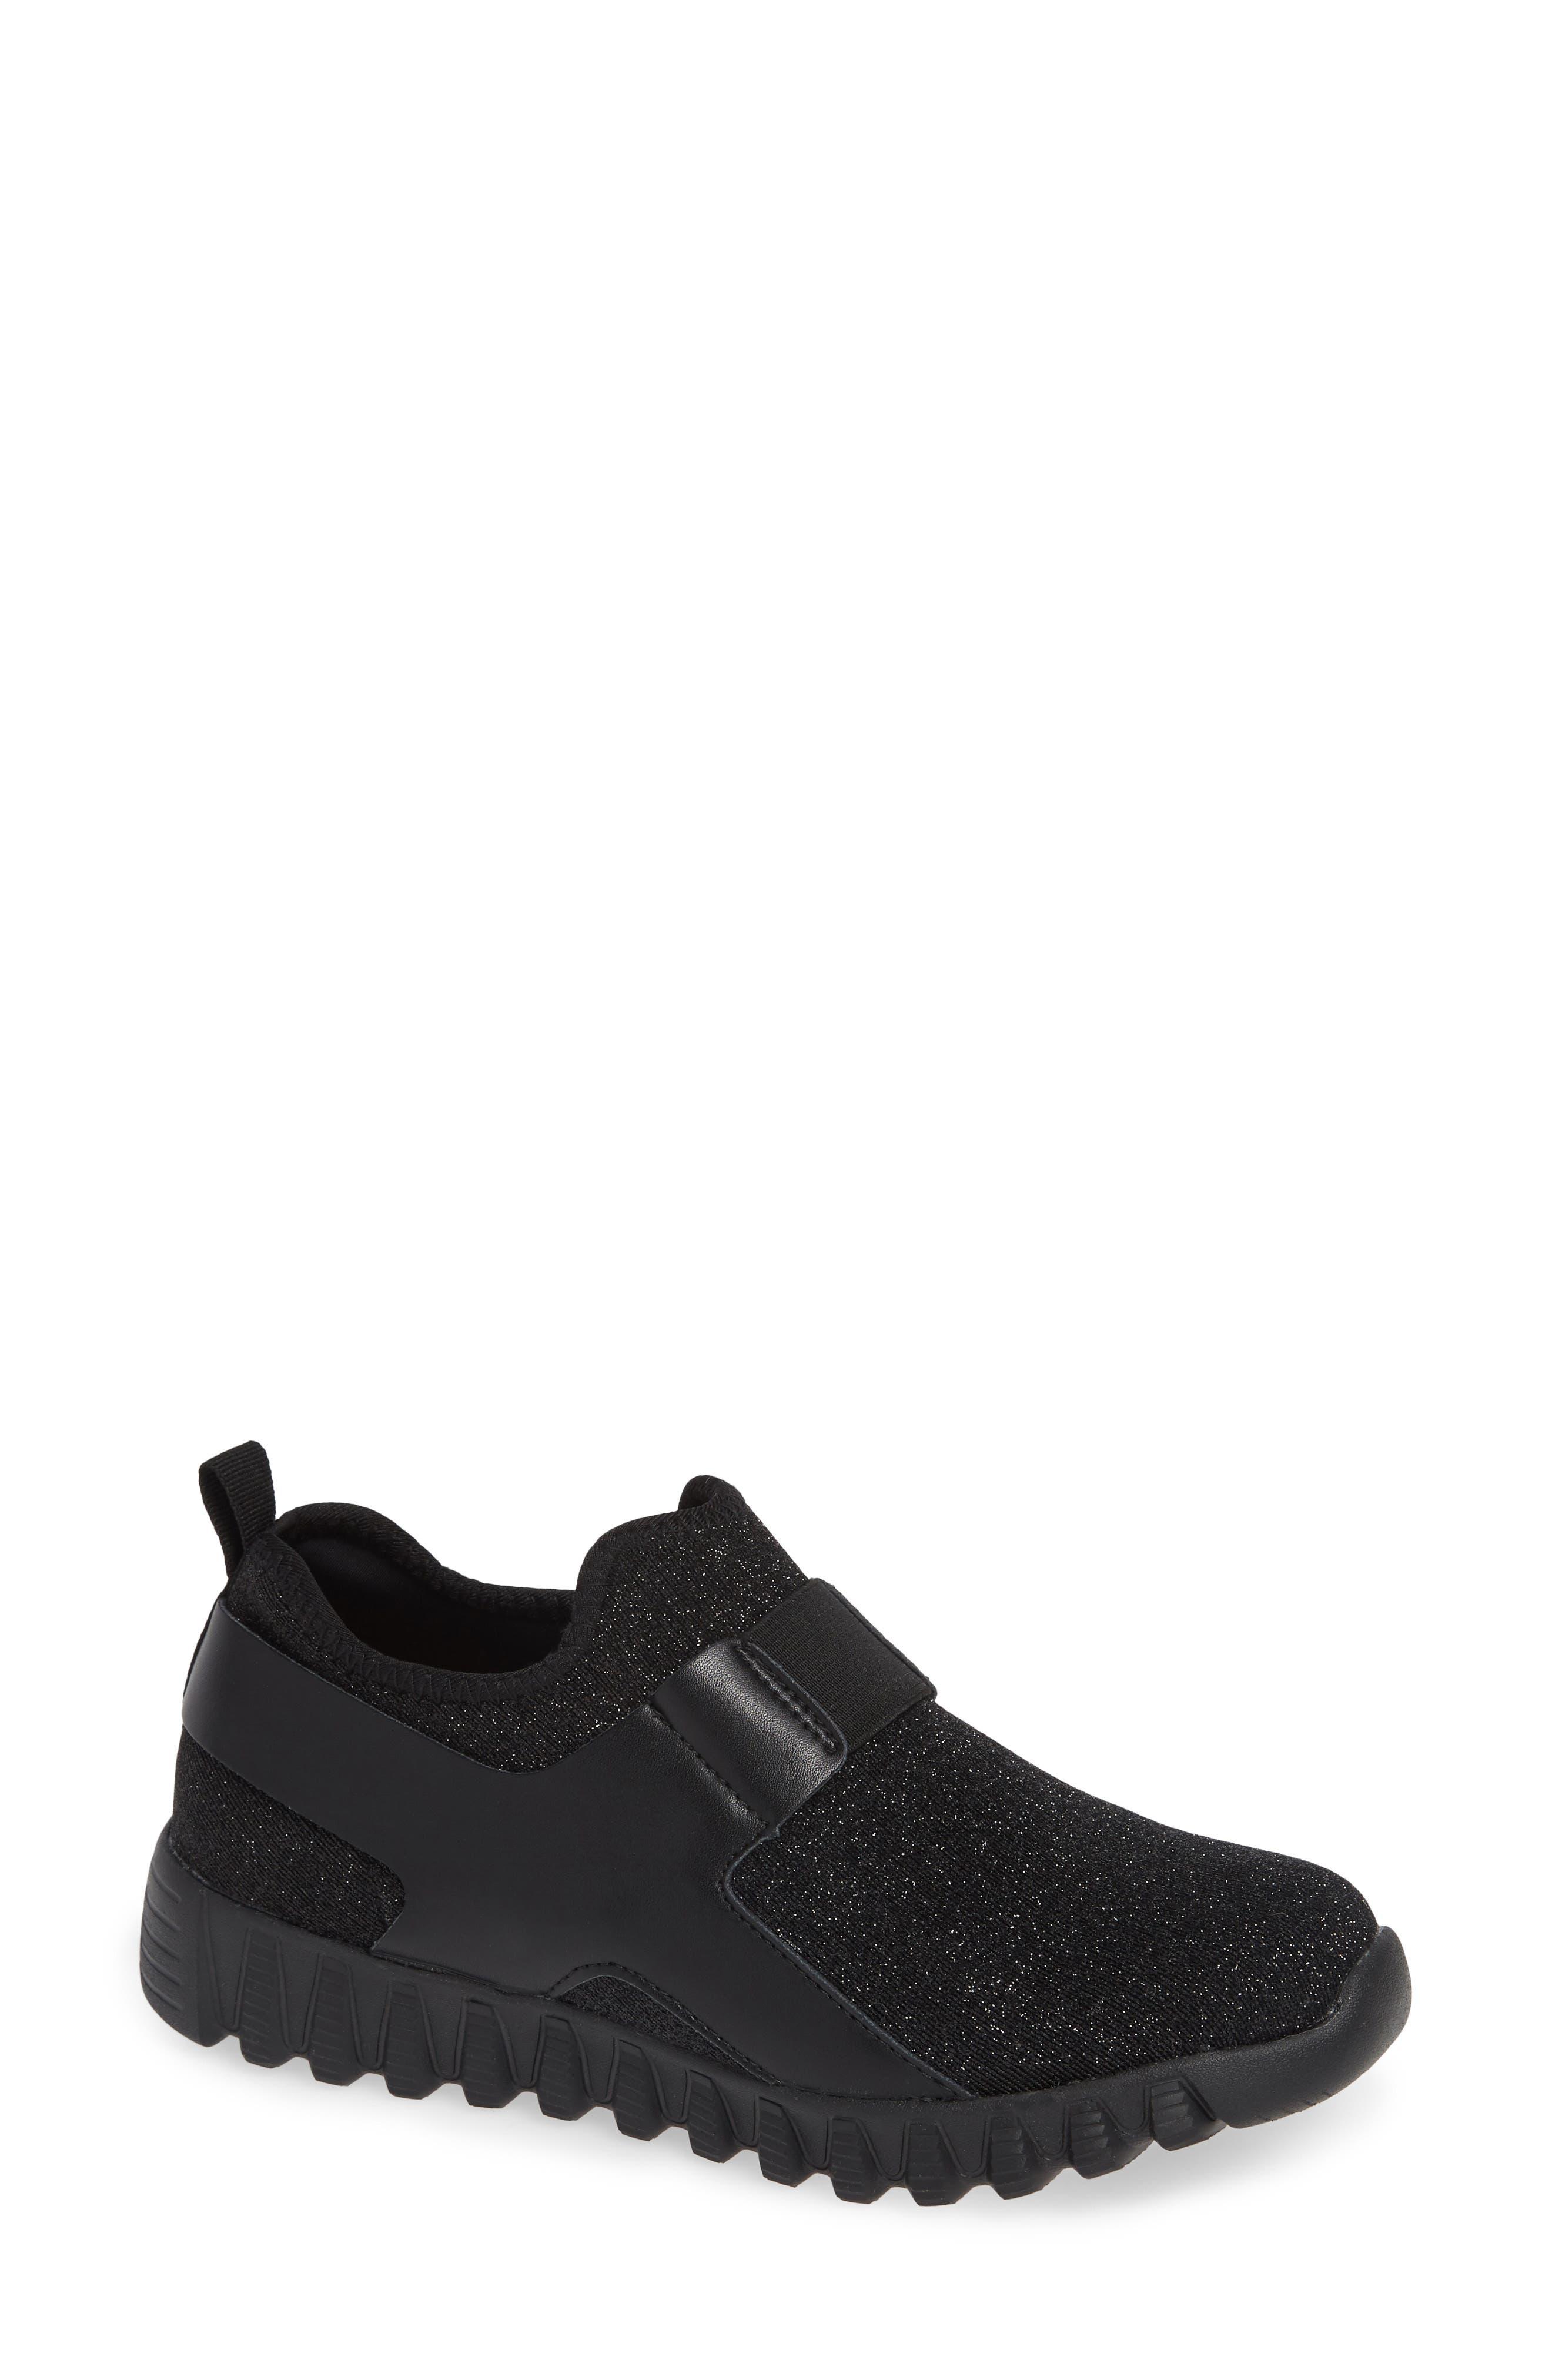 Bernie Mev. Glow Sneaker, Black